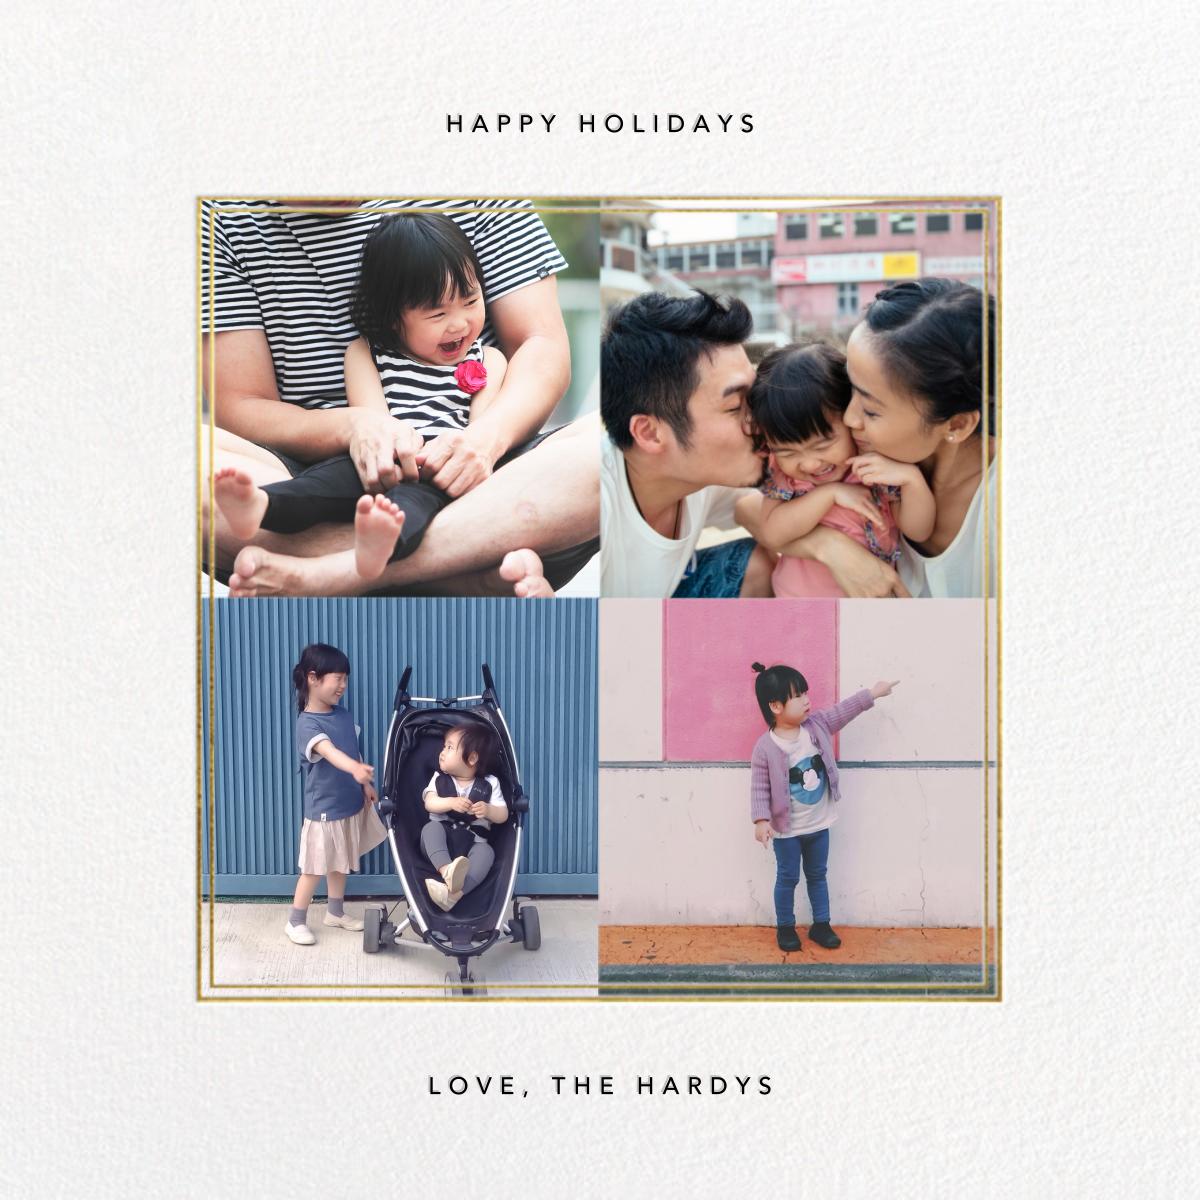 Quadrata (4 Photos) - Gold - Paperless Post - Holiday cards